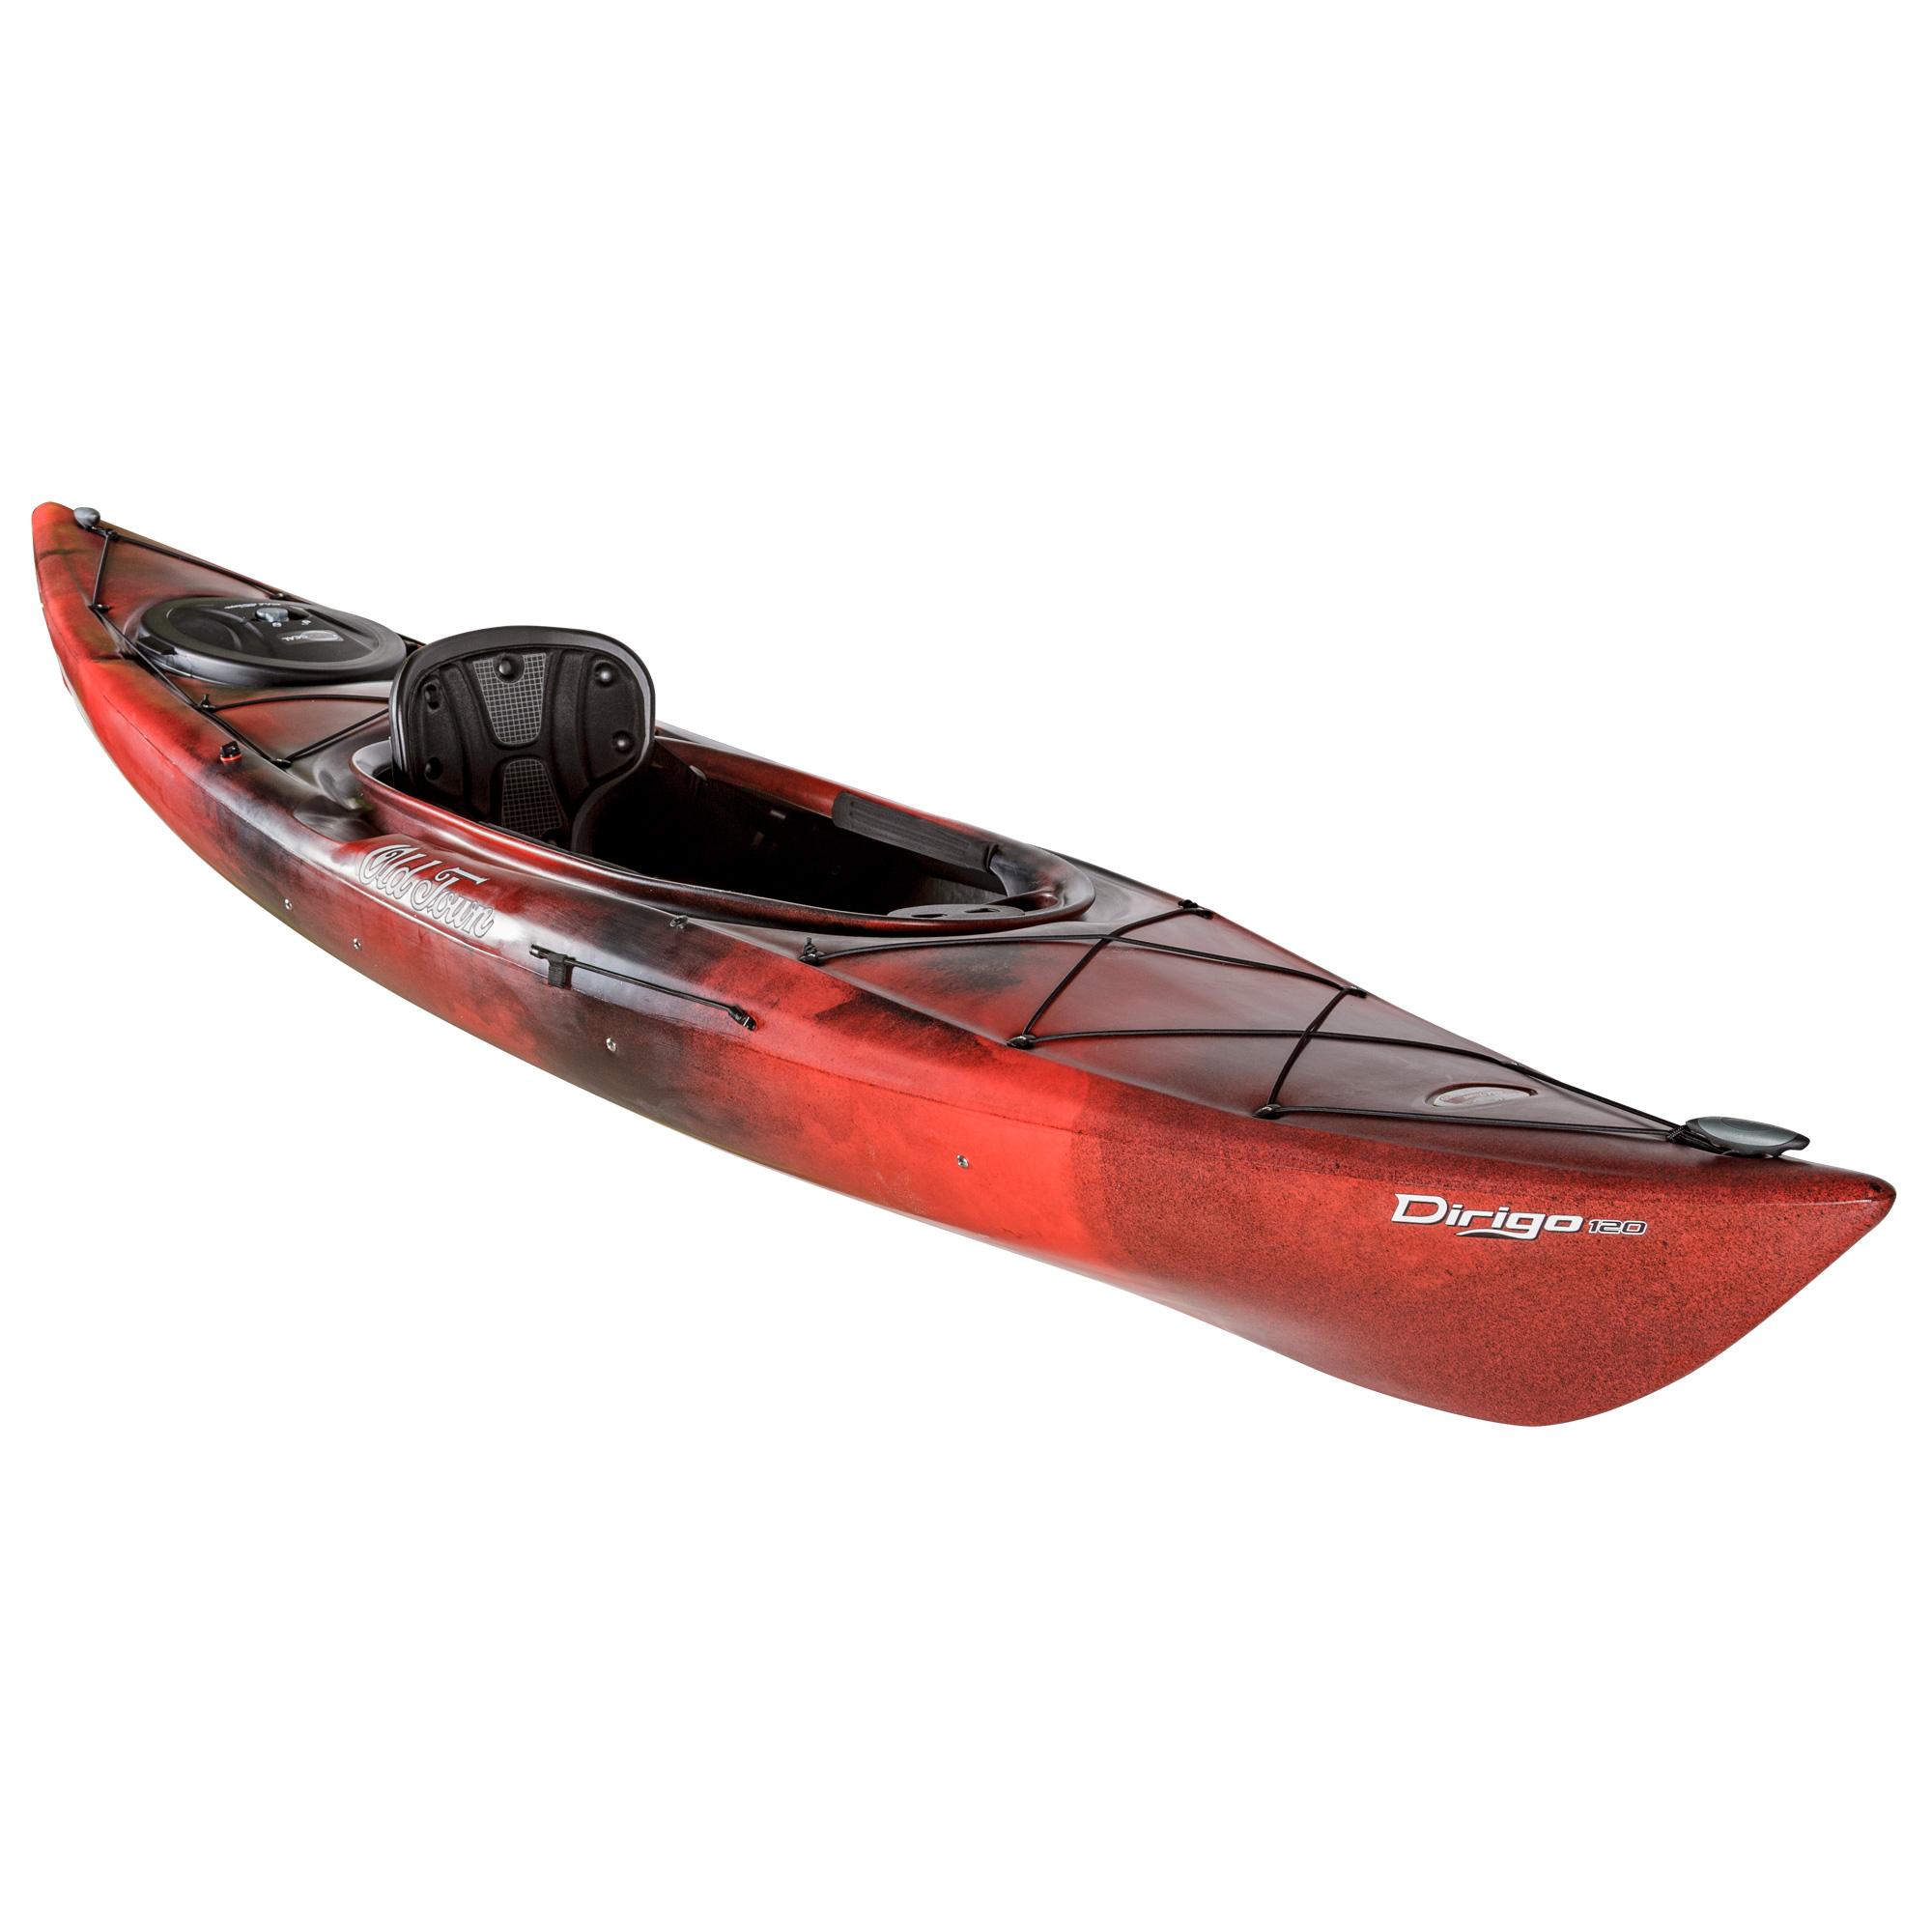 12' Dirigo 120 XT Old Town | Ottawa Valley Canoe and Kayak